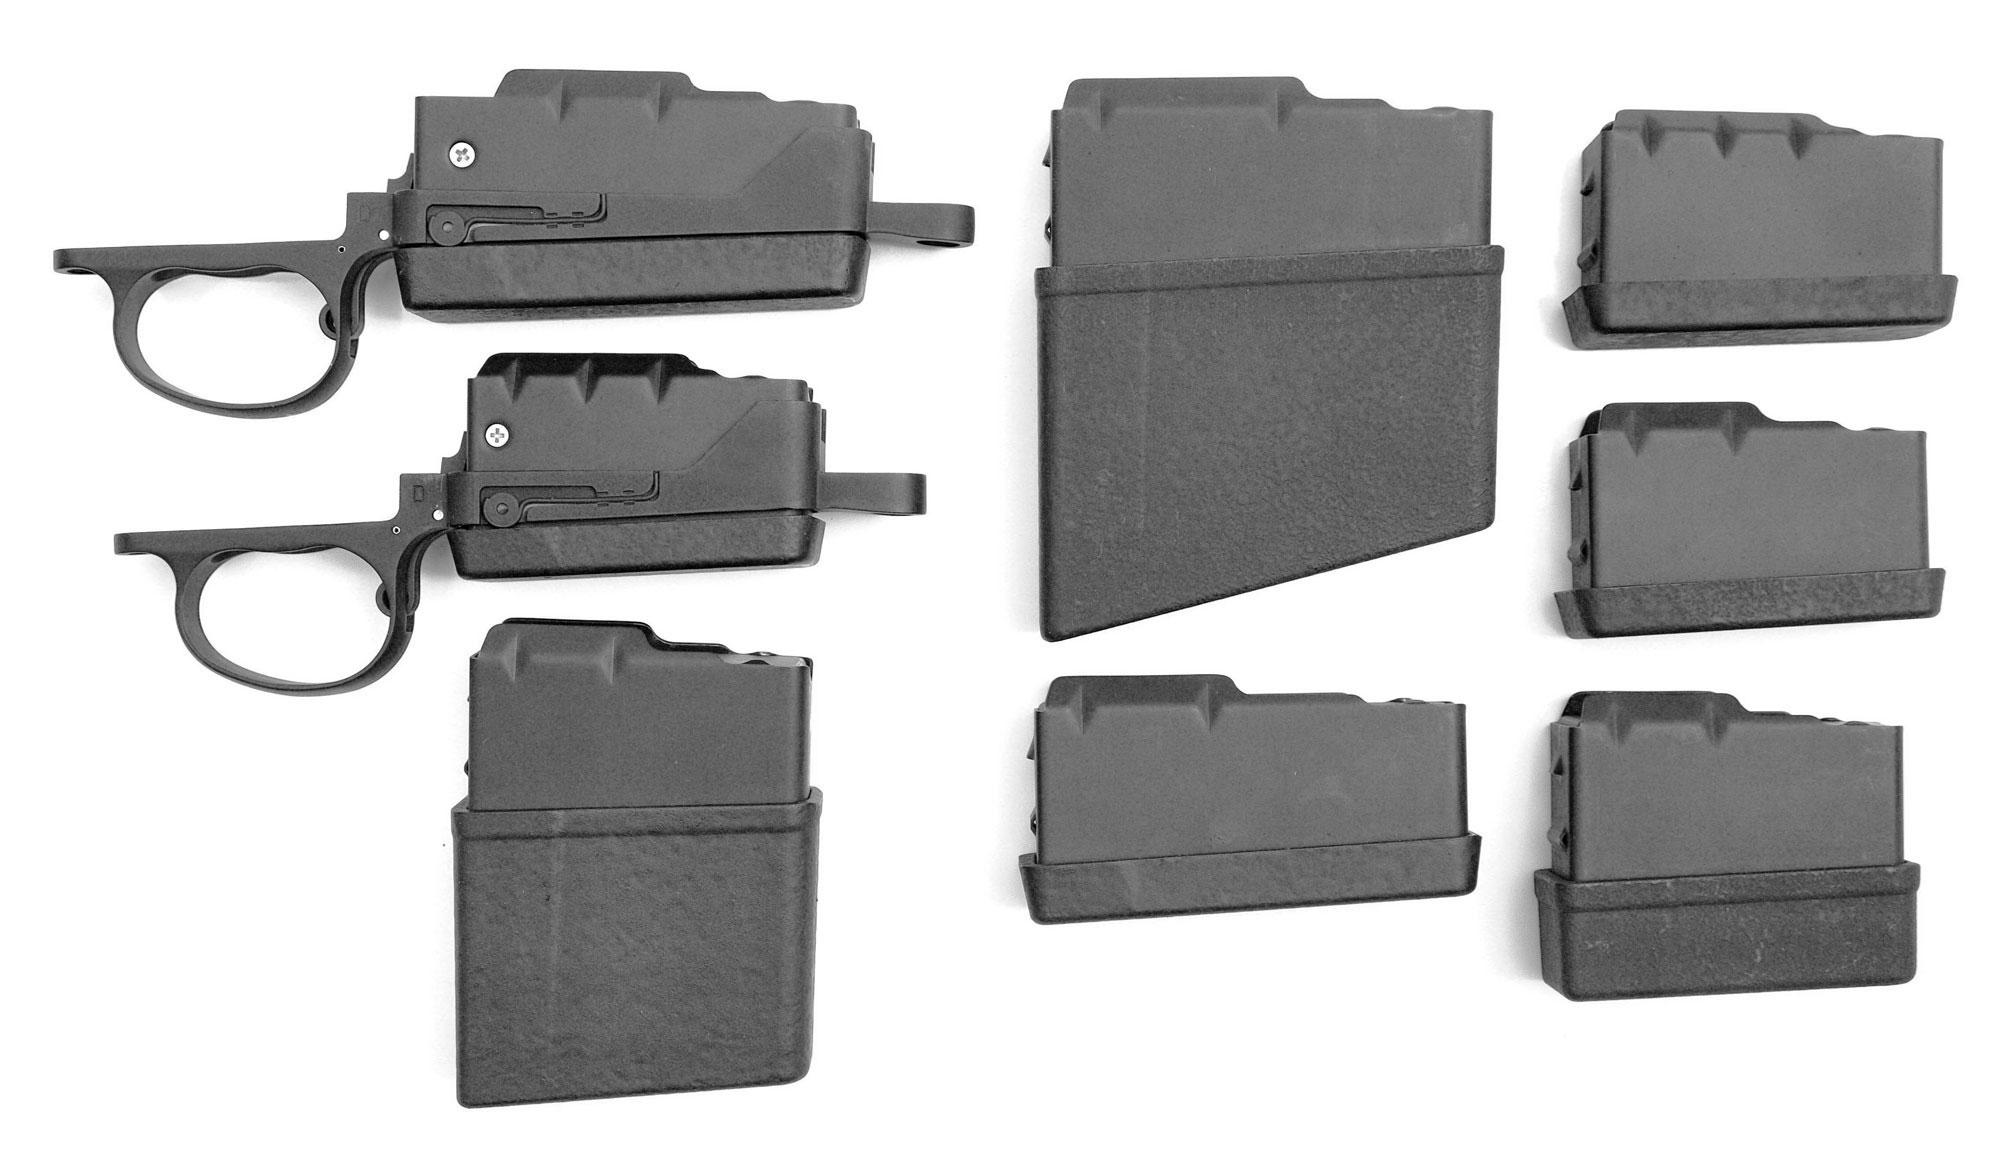 Remington 700 Detachable Magazine Conversion Kits